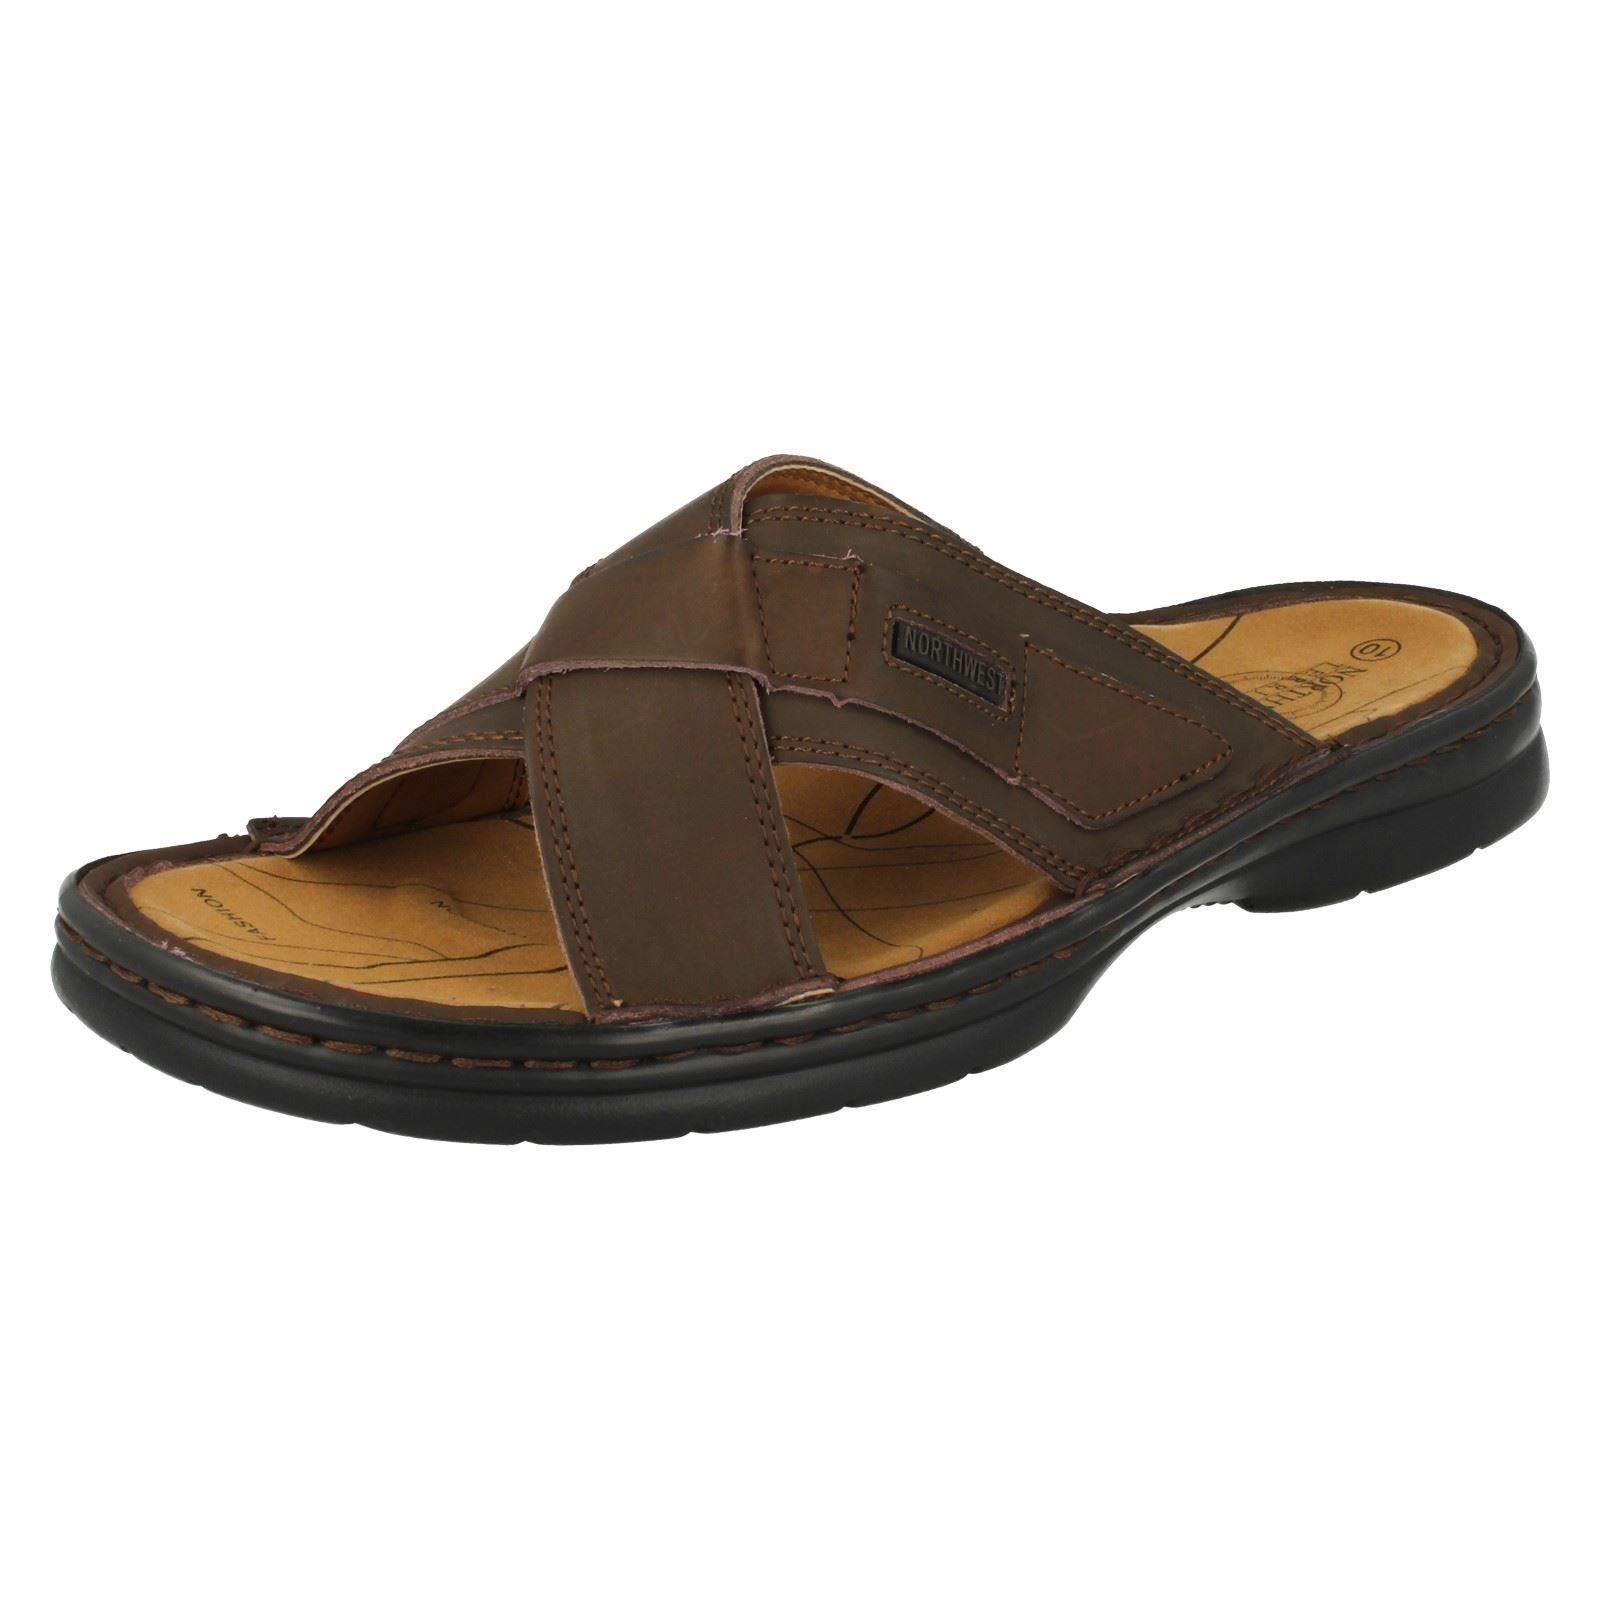 Northwest Territory 'SAHARA' Mens Brown Leather Slip On Summer Sandals